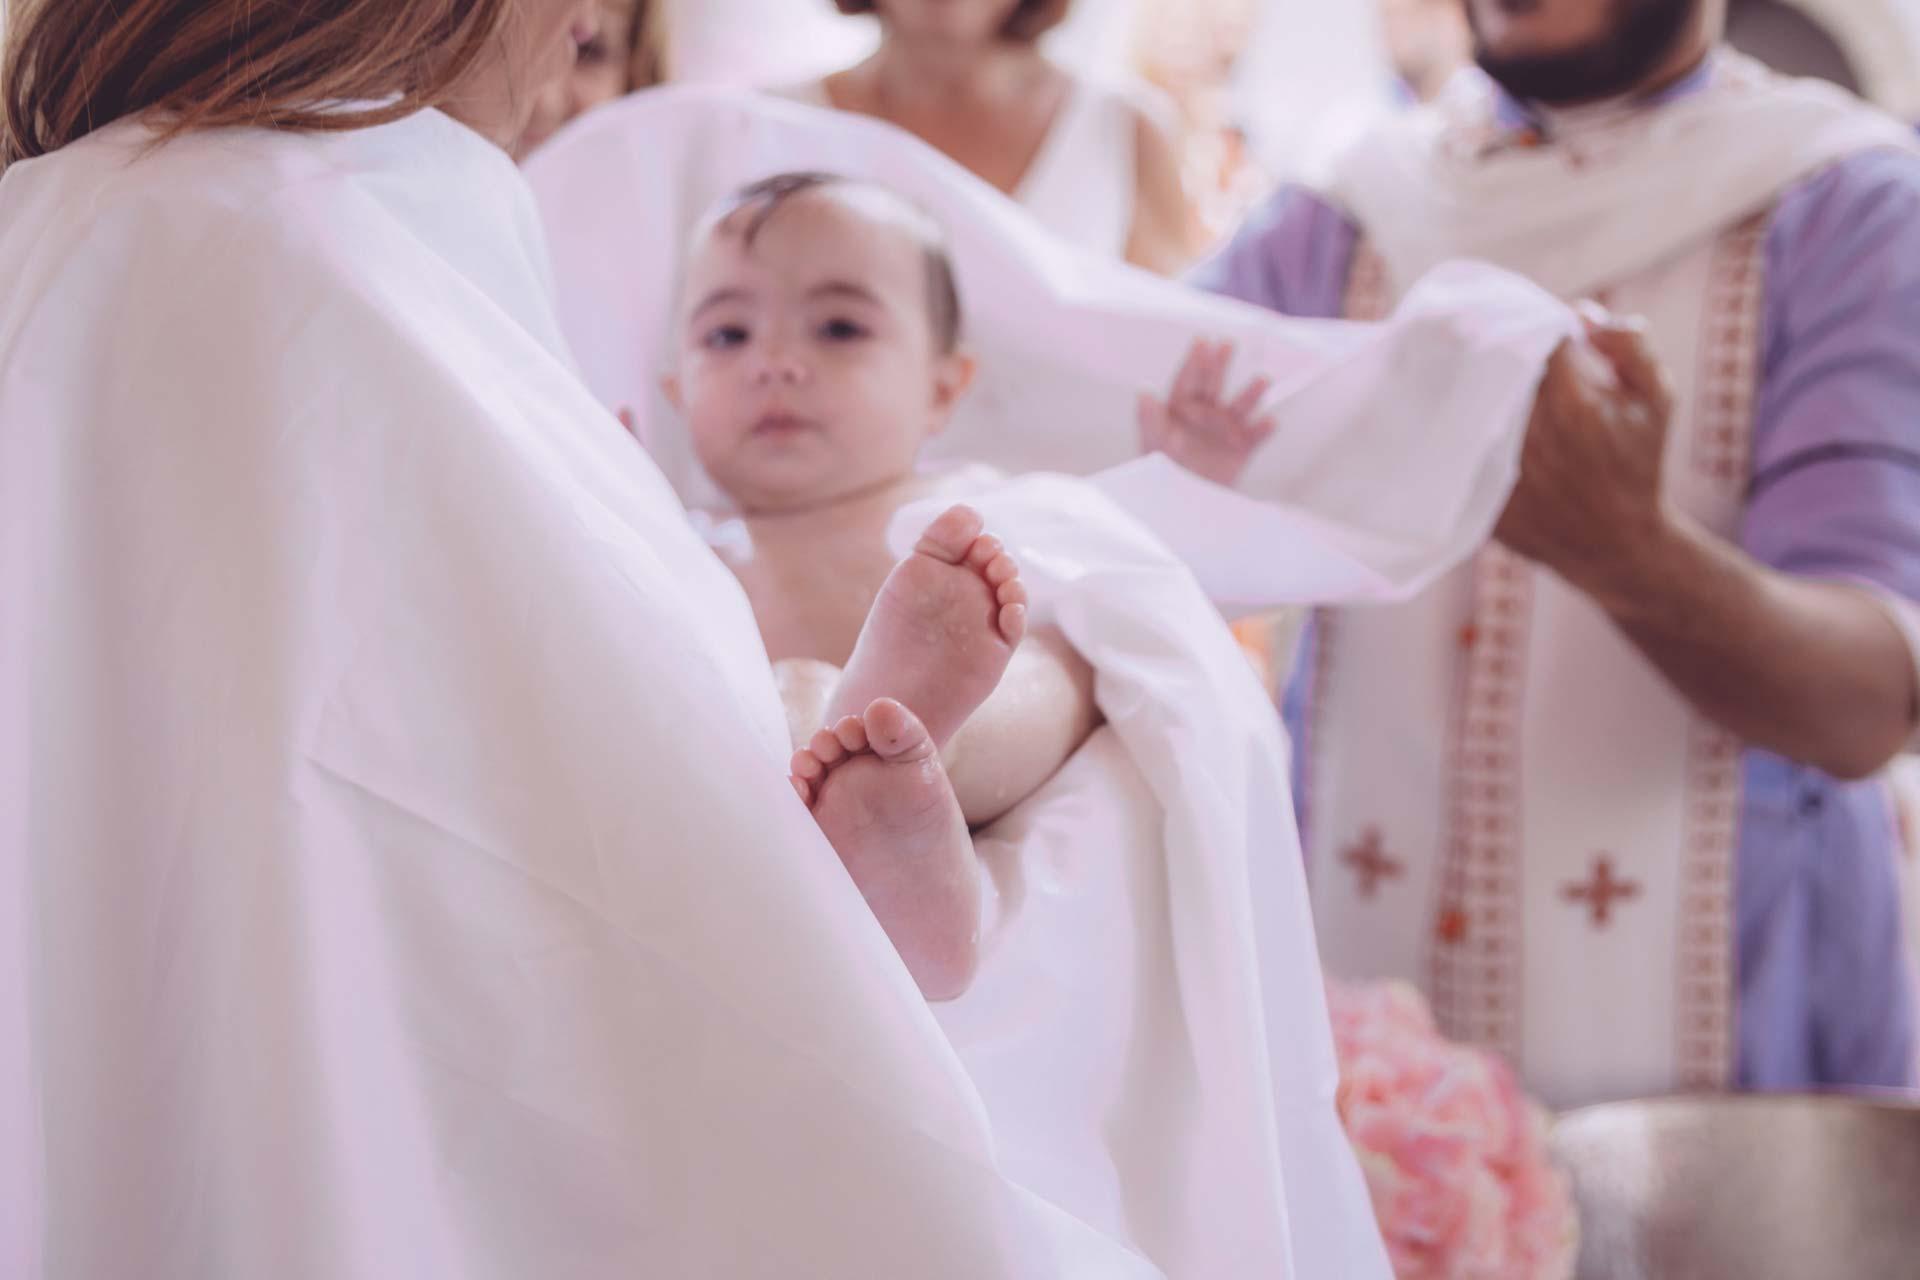 352 PhotoVaptisis βαπτιση σπετσεσ φωτογραφοσ vaptisi koritsi agios nikolaos spestes island photographer